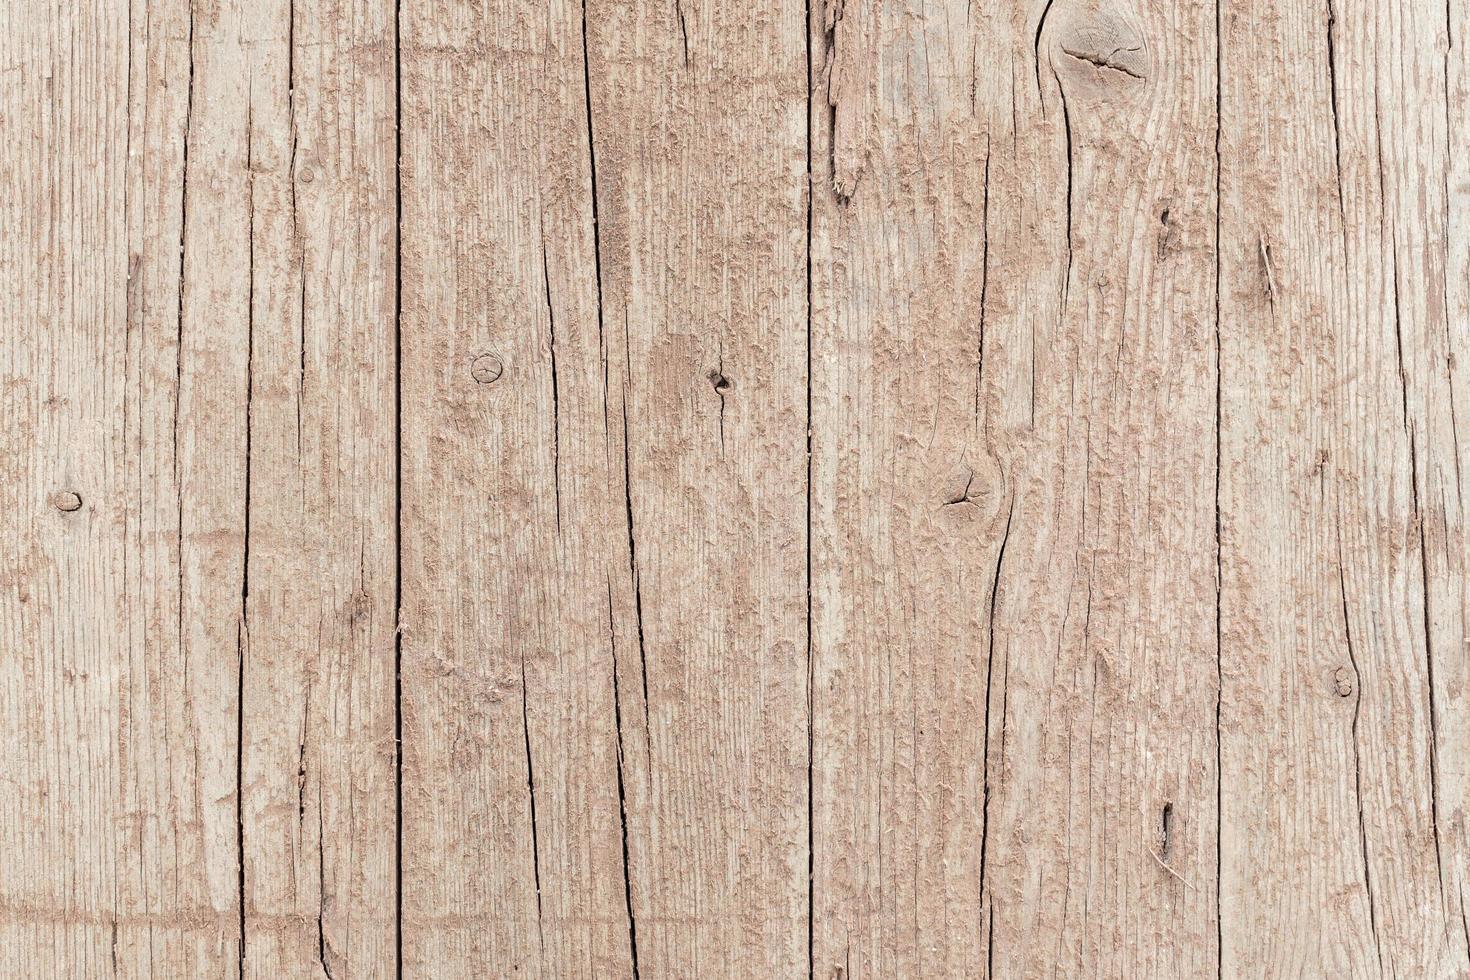 superficie di legno rustica foto